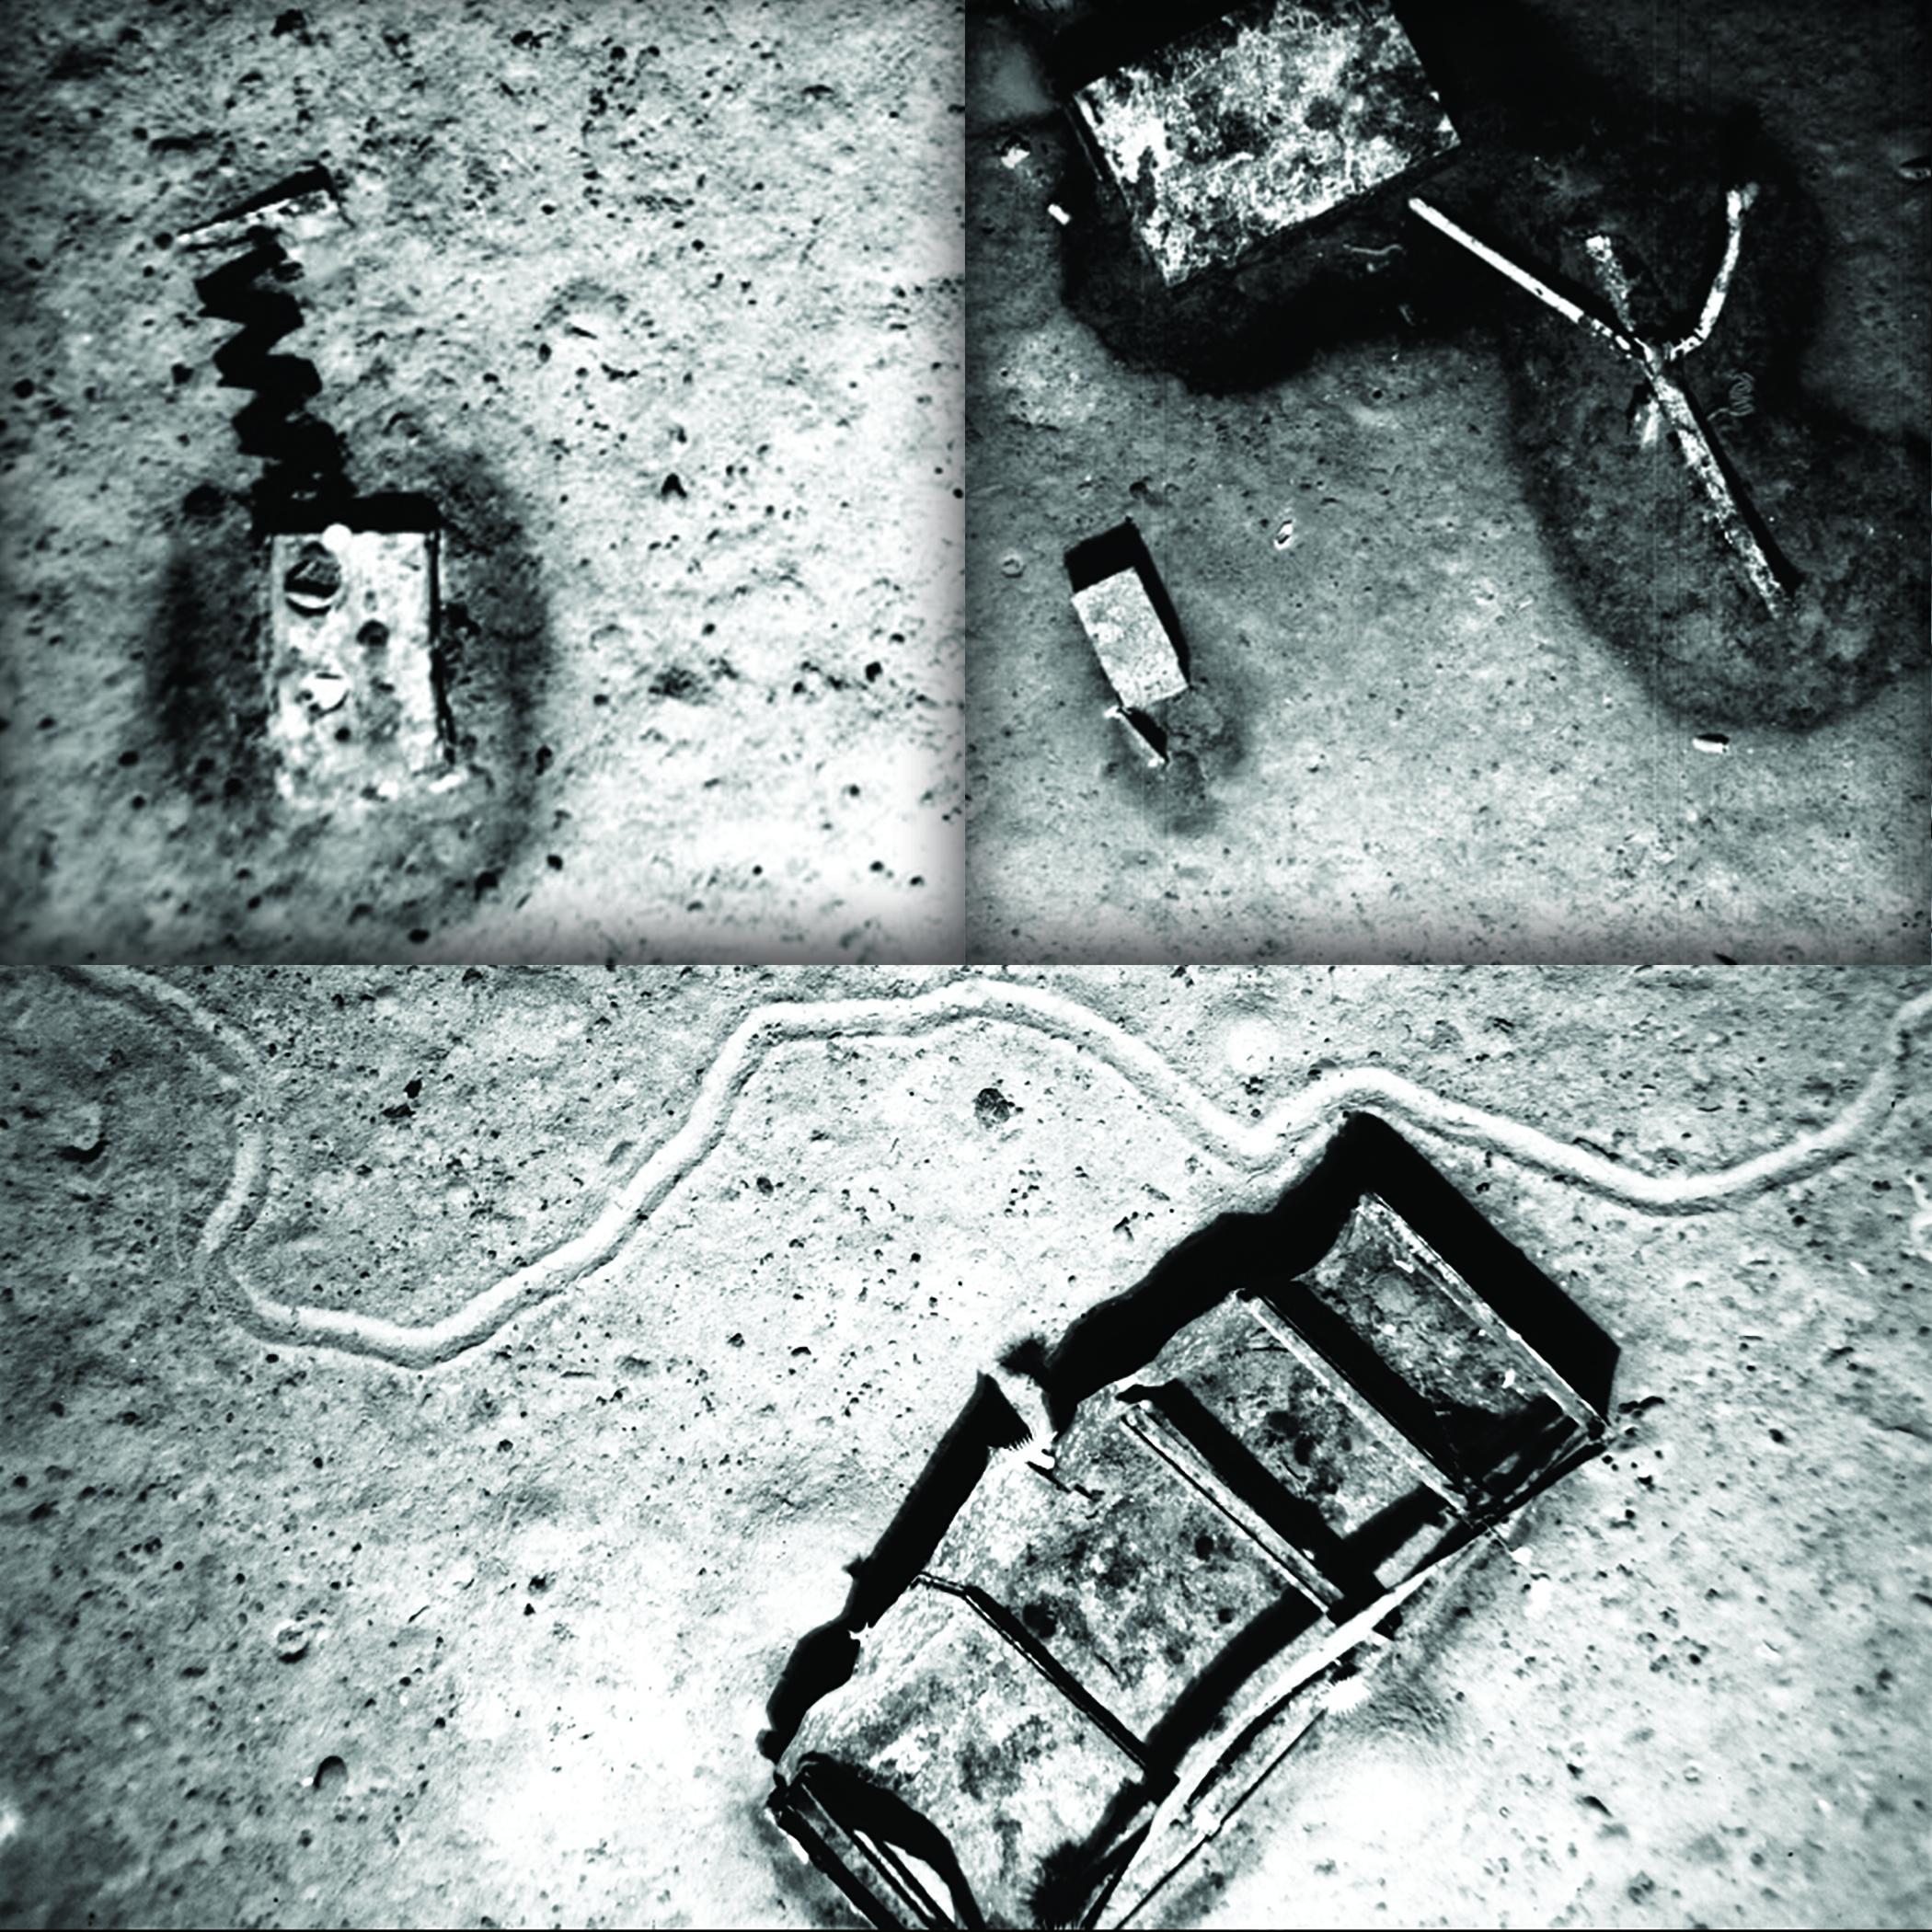 49 Wreckage - image 256